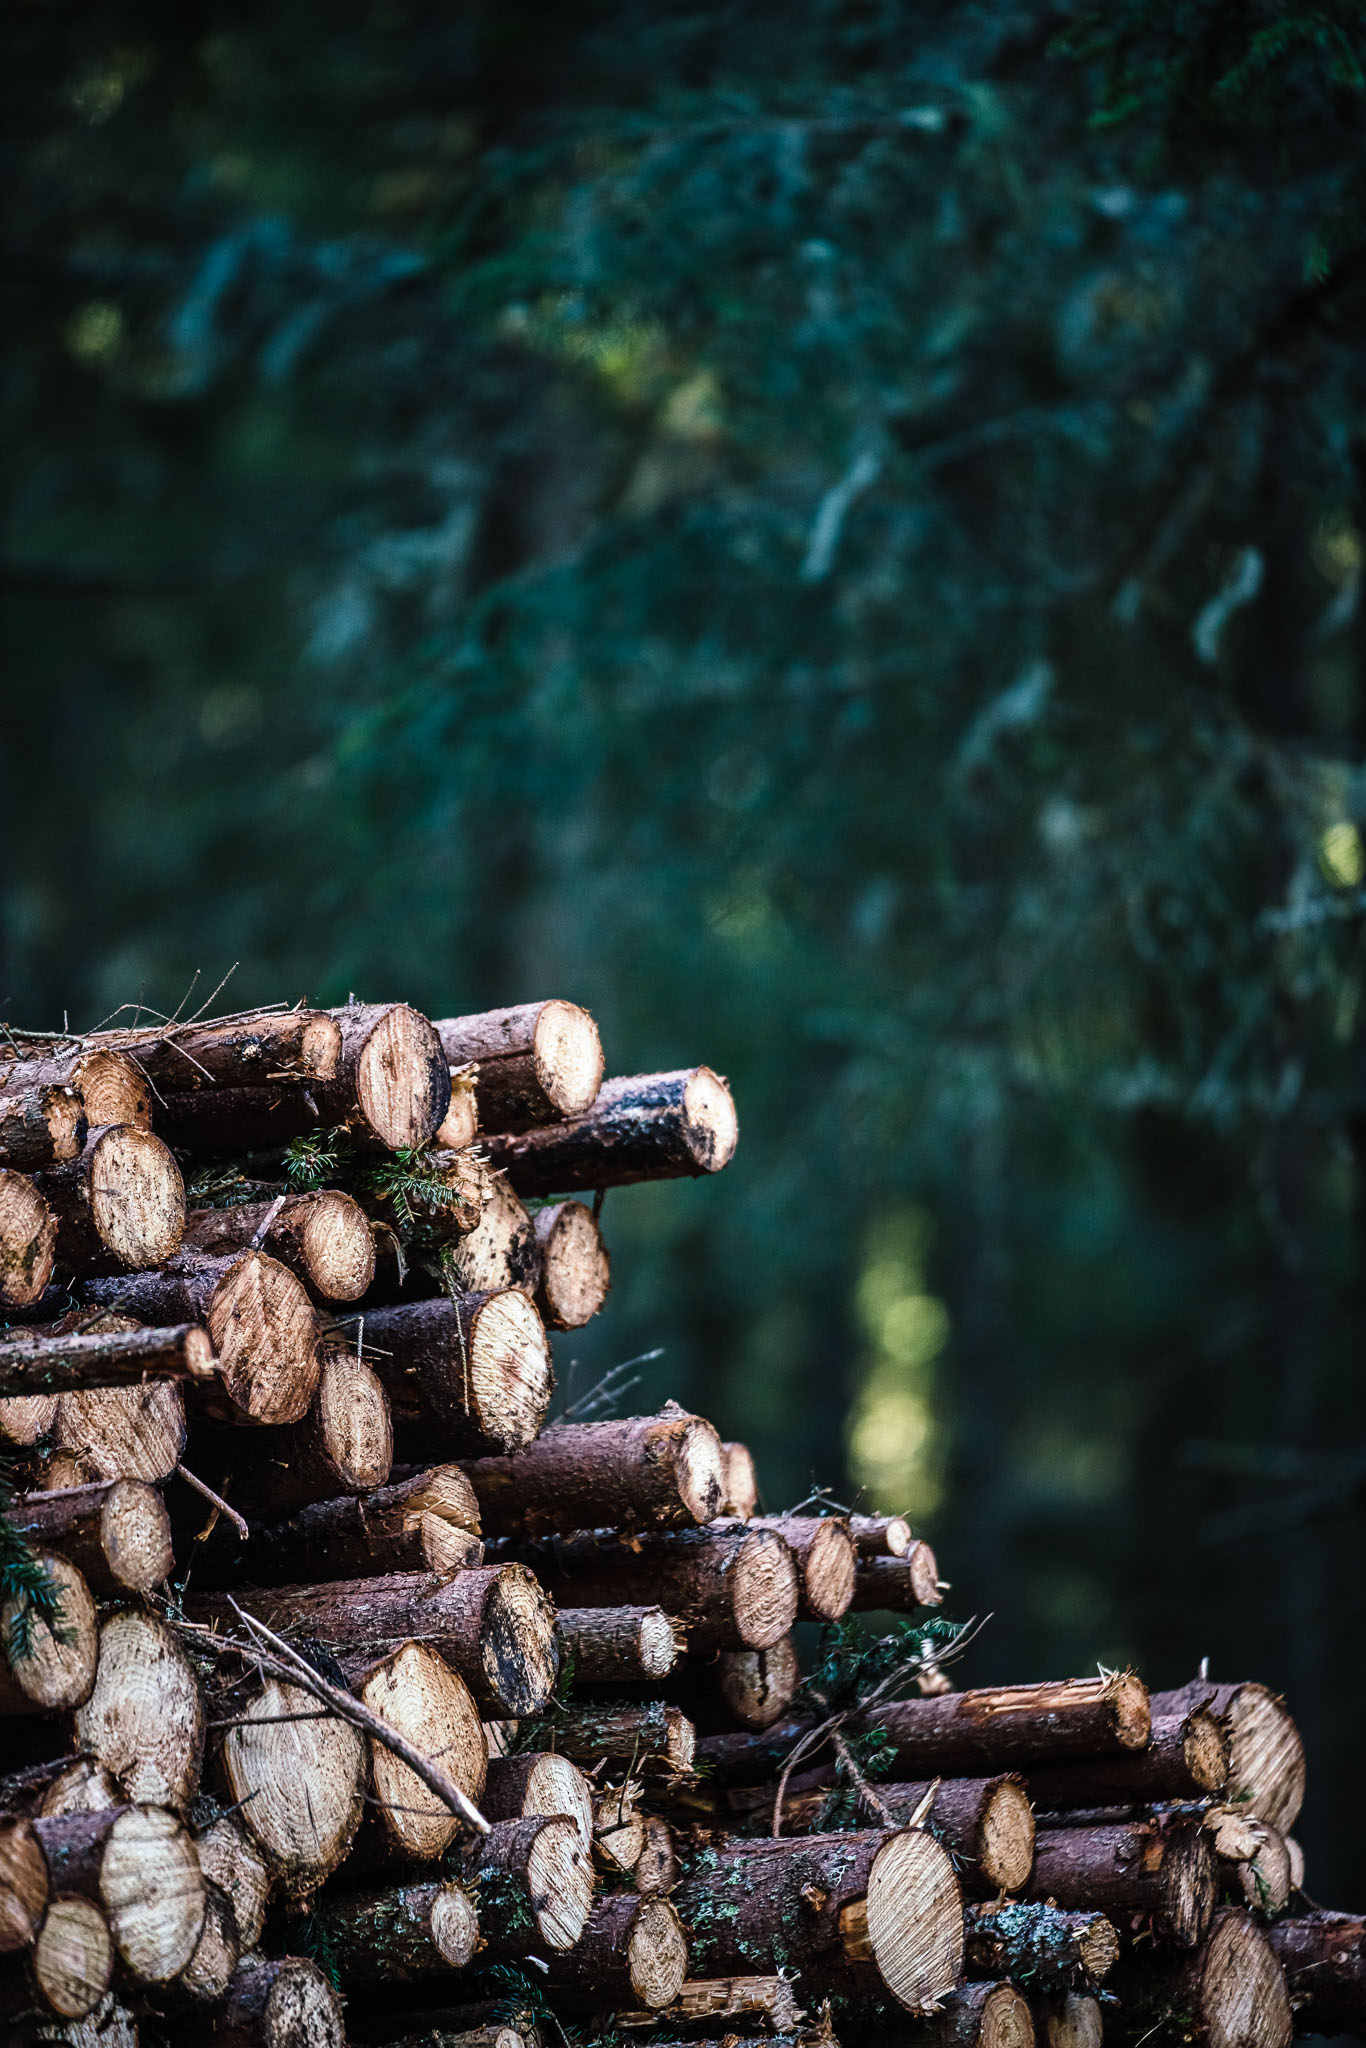 genrebildvirke-avverkning-industrifotograf-skog-massaindustri-pappersindustri-skogsindustri-sverige